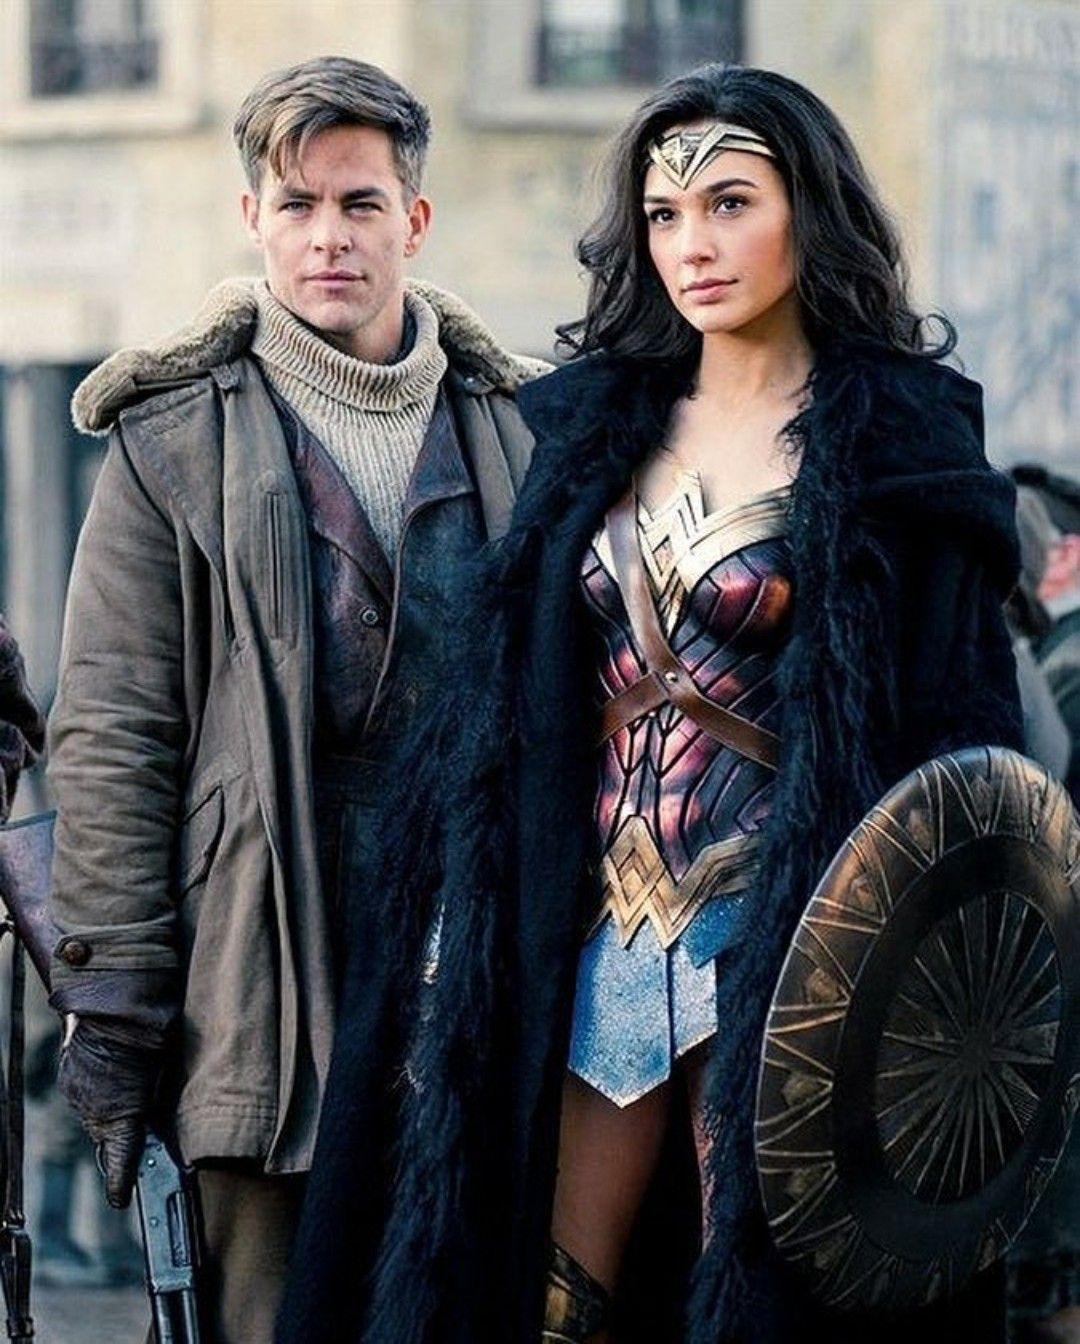 Steve Trevor Wonder Woman Gal Gadot Wonder Woman Wonder Woman Movie Wonder Woman